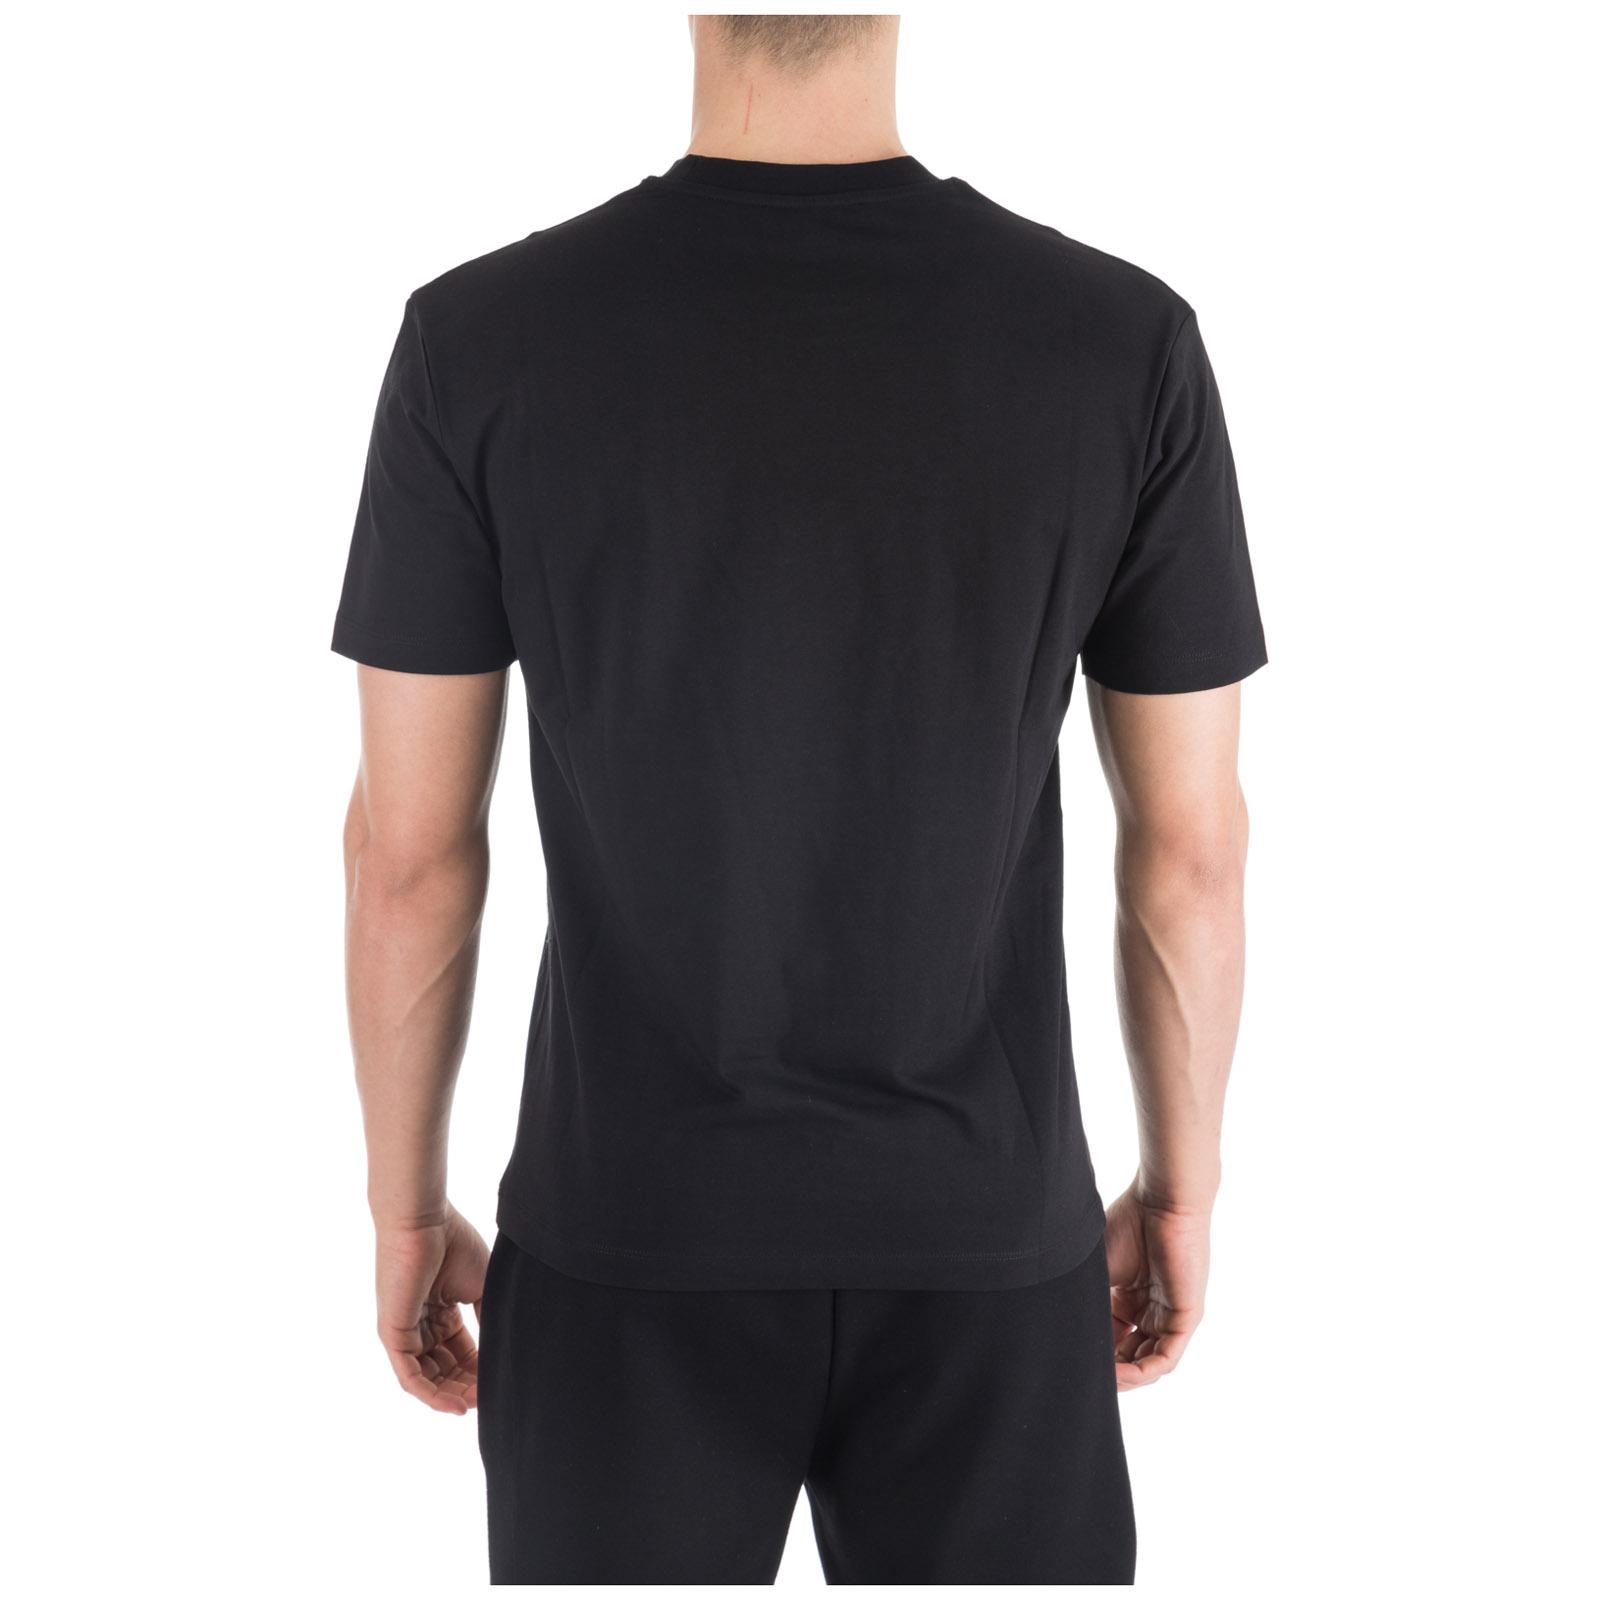 Men's short sleeve t-shirt crew neckline jumper